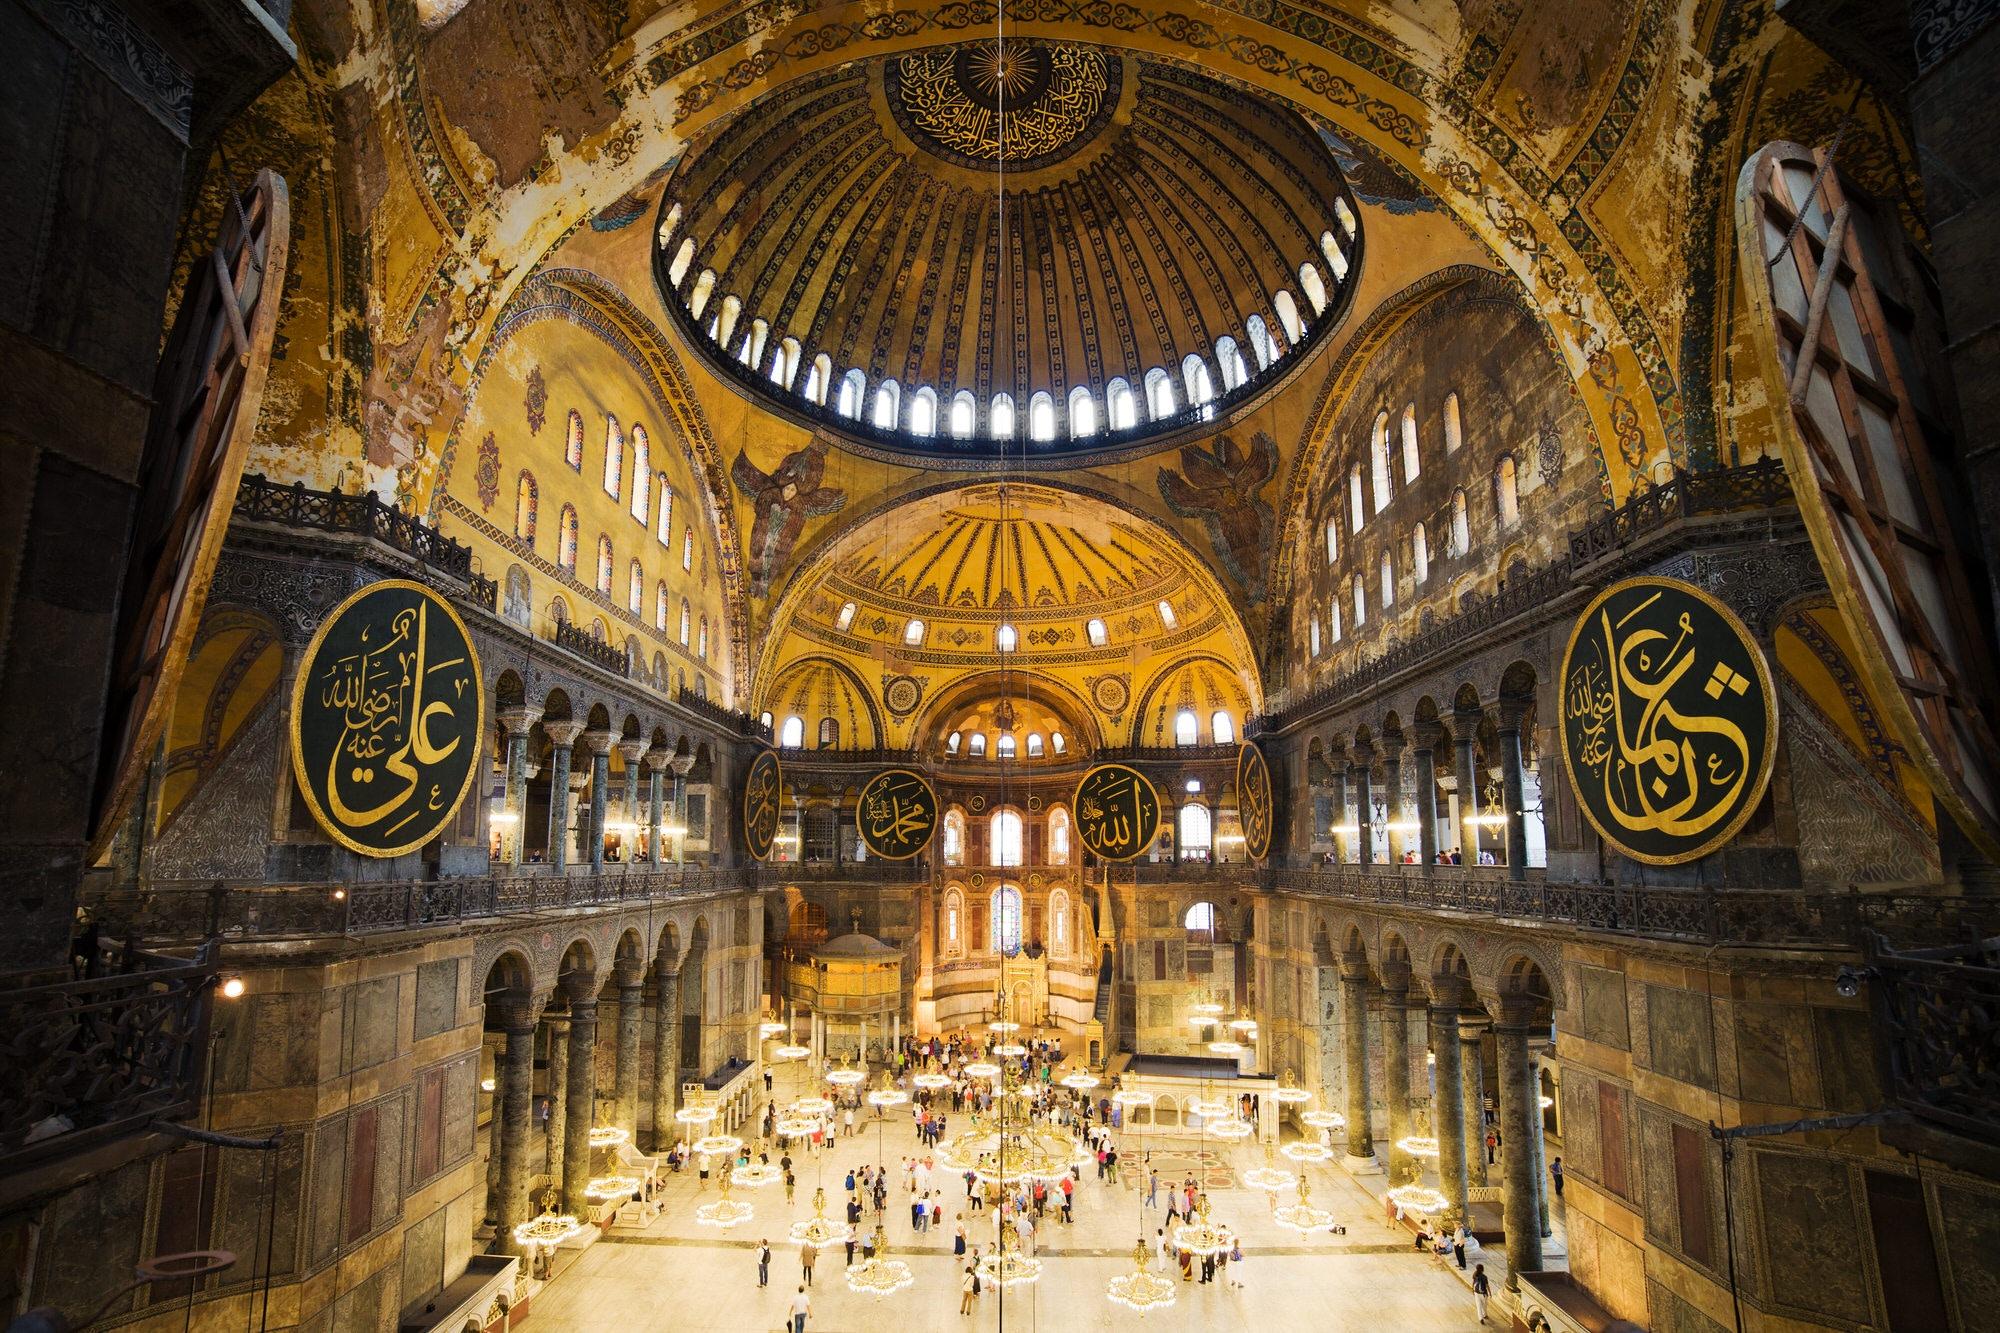 Interior shot of the Aya Sofya, in Istanbul